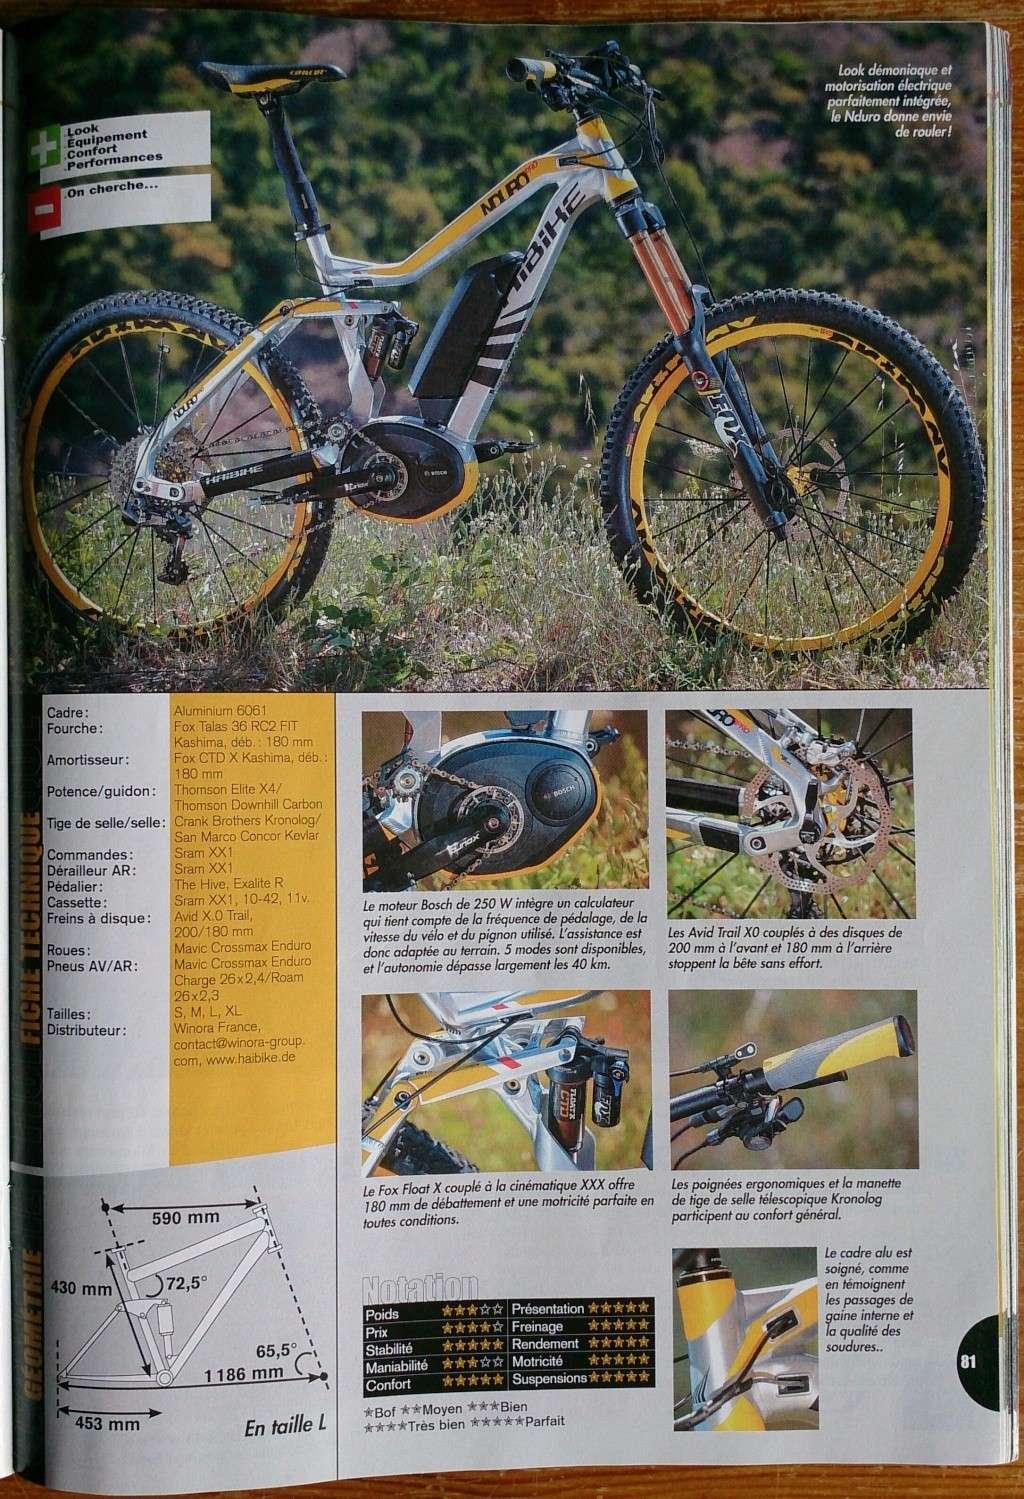 [Luidji76] Mon nouveau bike: VAE Haibike XDURO NDURO RX 26 - Page 2 Dsc_0111